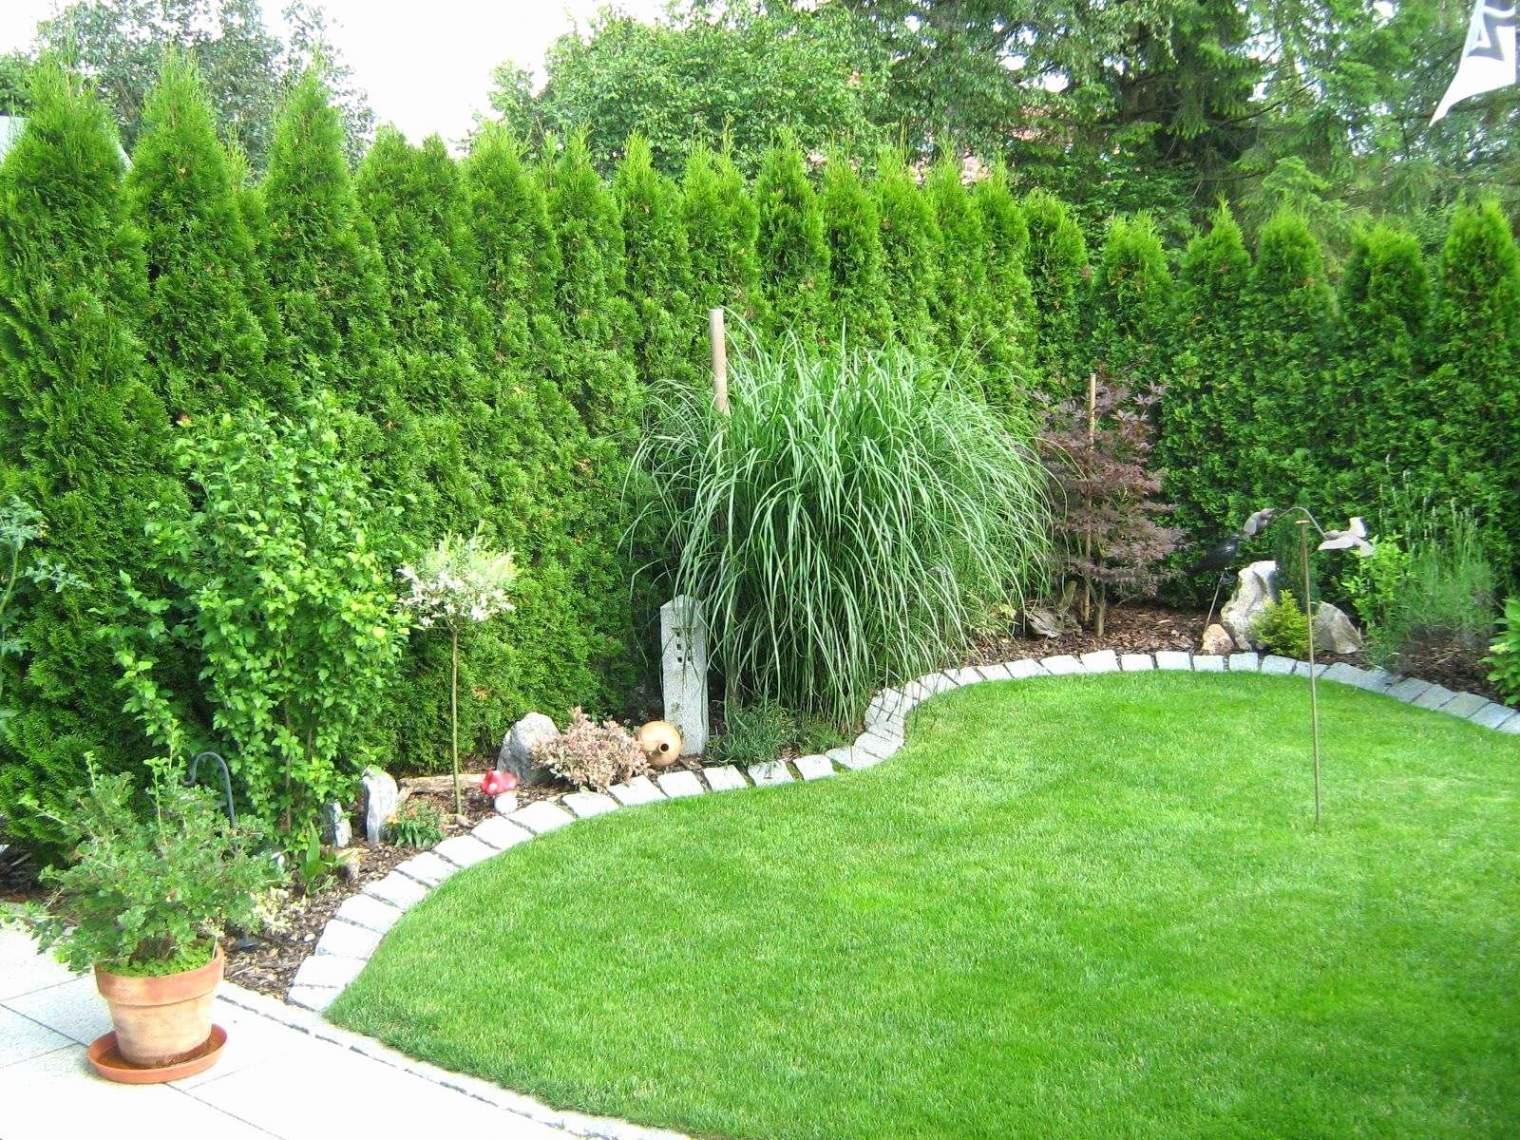 30 Elegant Beton Ideen Fur Den Garten Einzigartig Garten Anlegen